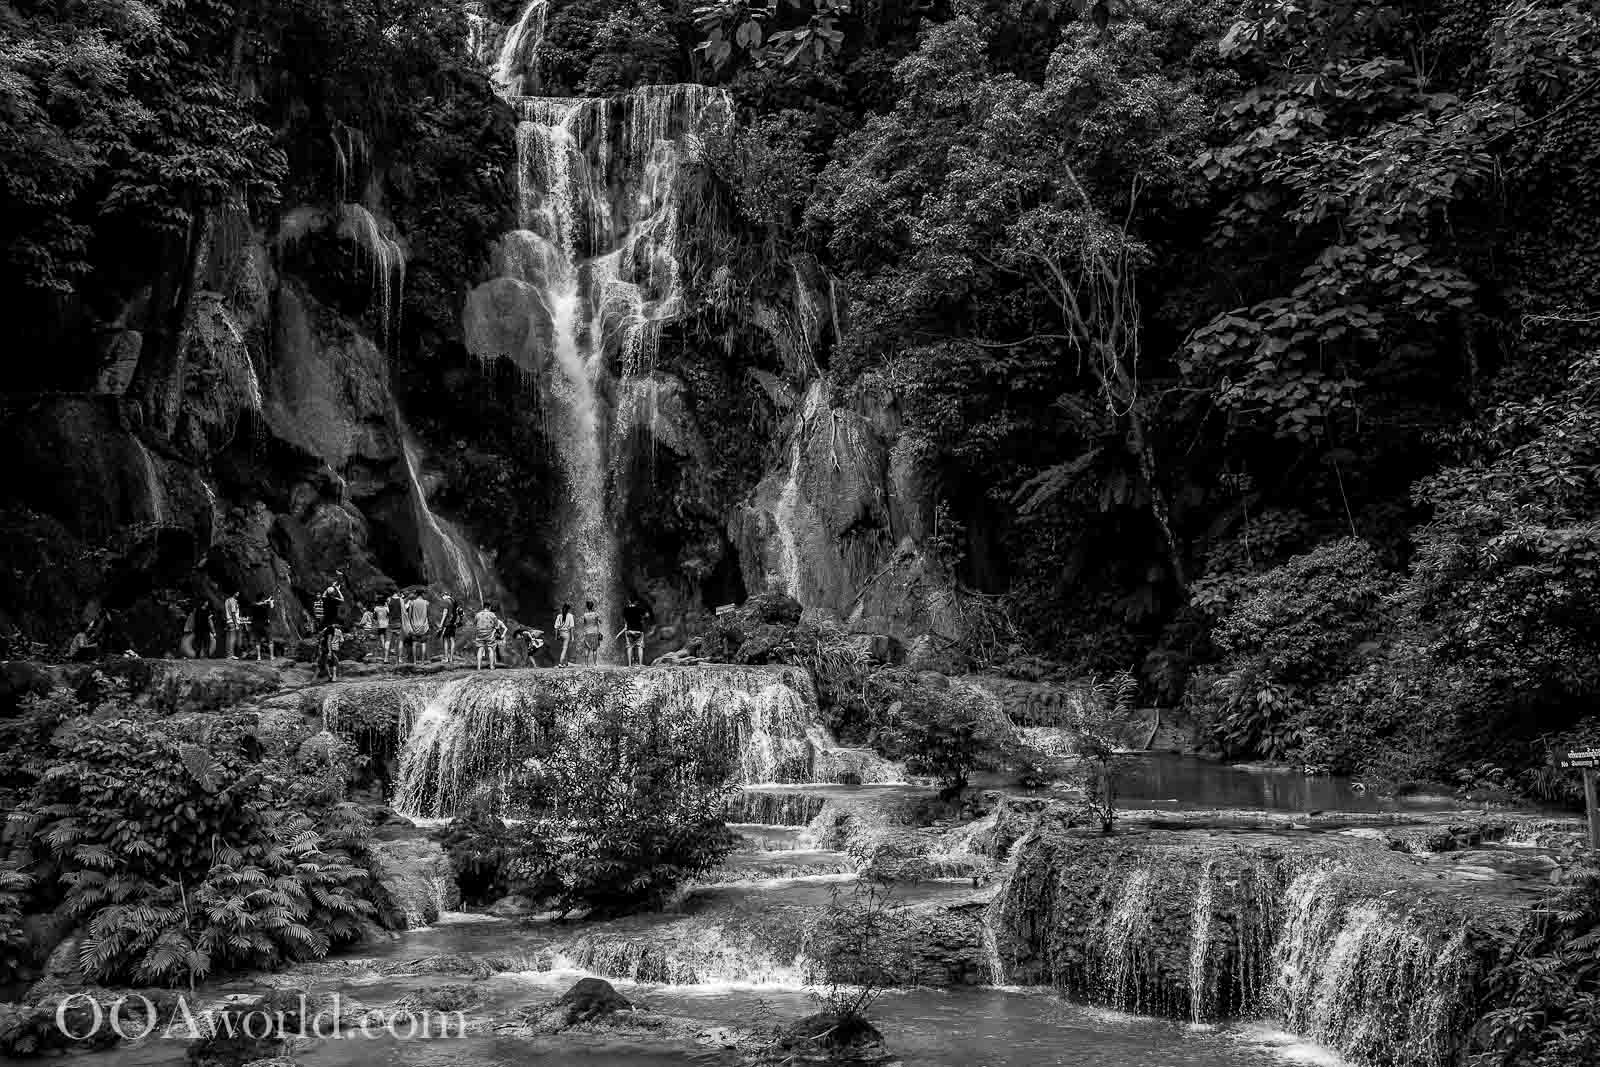 Luang Prabang Waterfall Kuang Si Falls Photo Ooaworld